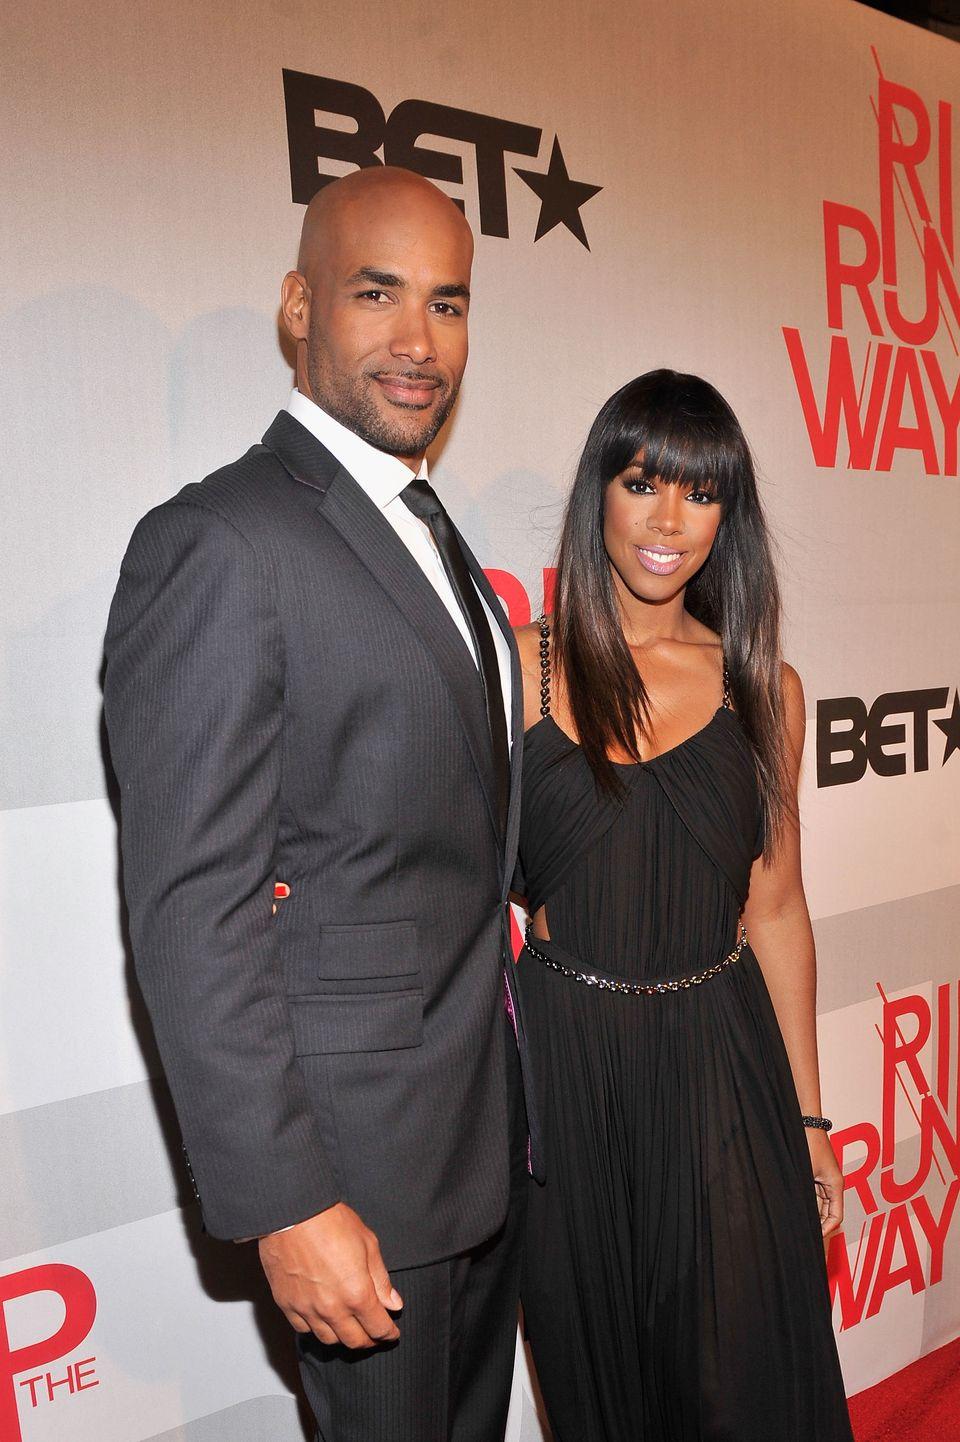 NEW YORK, NY - FEBRUARY 27:  Hosts Boris Kodjoe and Kelly Rowland attend BET's Rip The Runway 2013:Red Carpet at Hammerstein